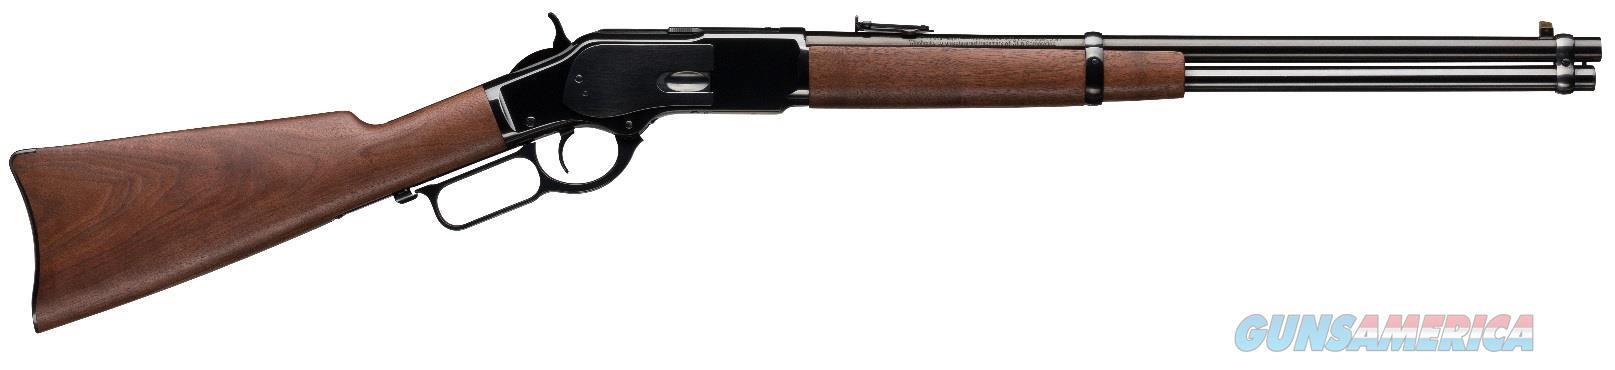 Winchester 1873 CARBINE 45LC BL/WD 20   Guns > Rifles > Winchester Rifles - Modern Bolt/Auto/Single > Model 70 > Post-64